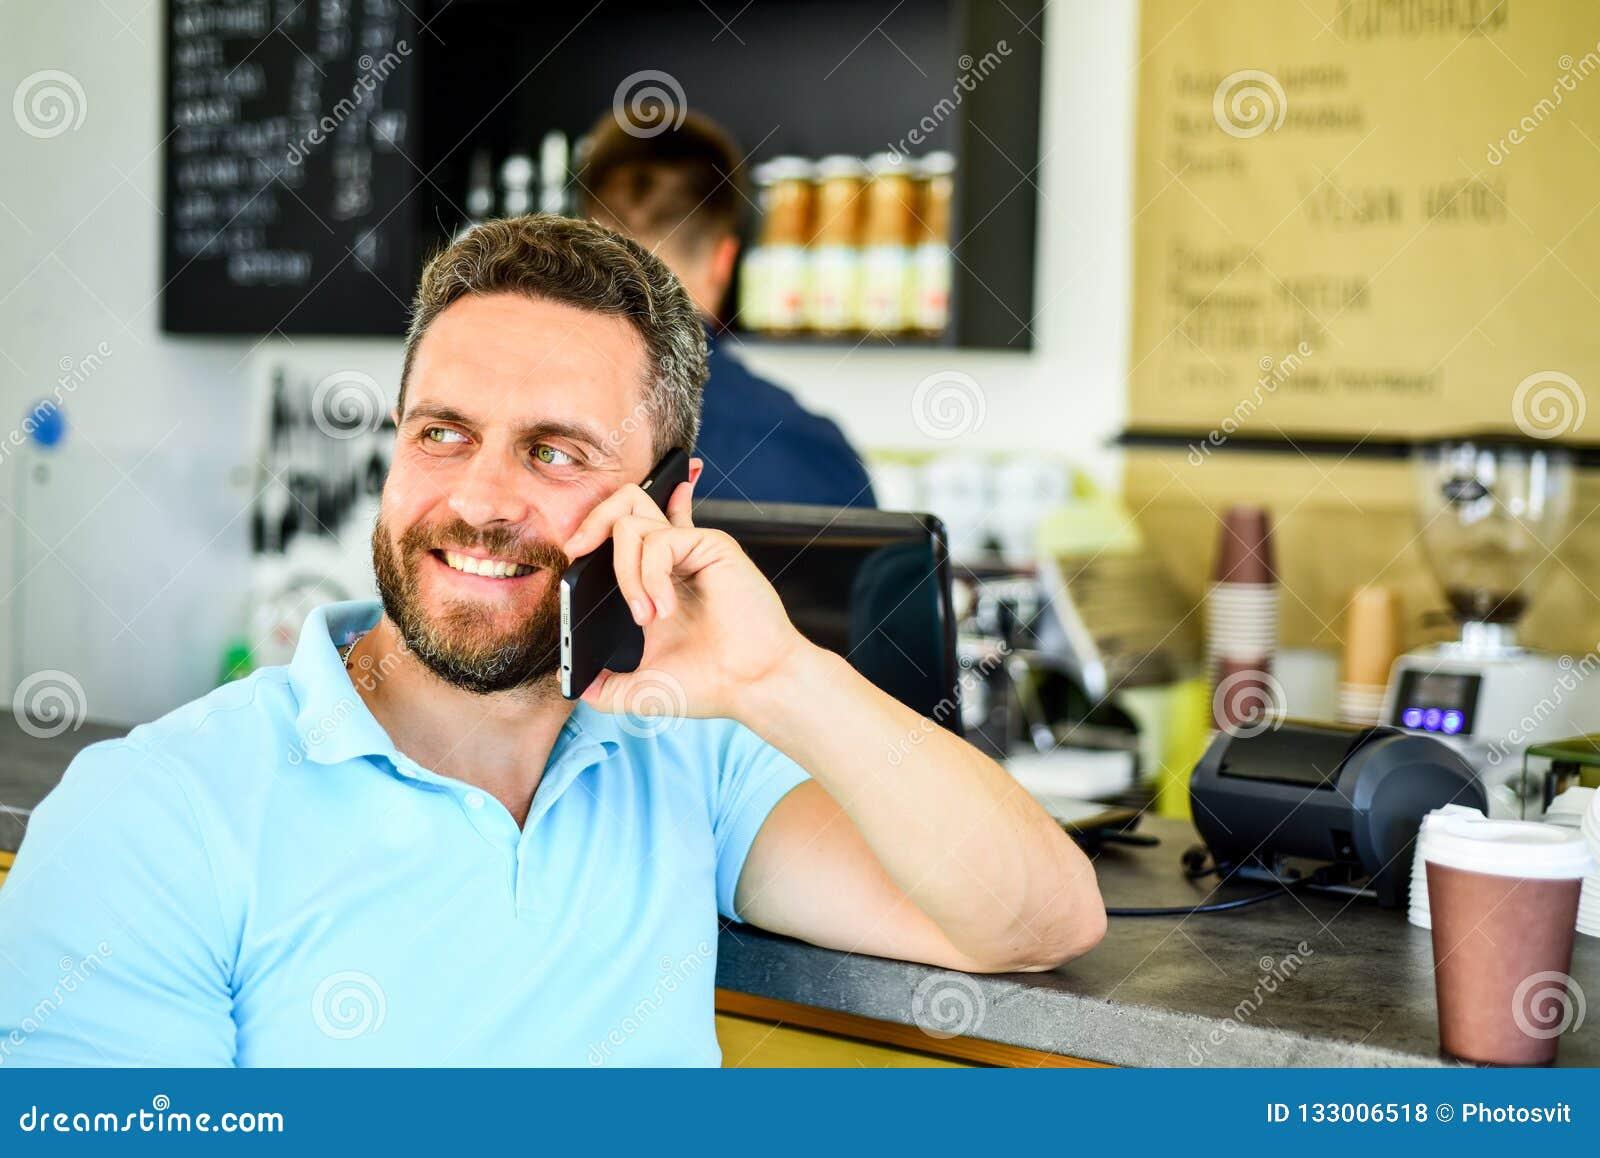 Take Break Coffeebreak : Man with smartphone order coffee coffee break concept lets meet